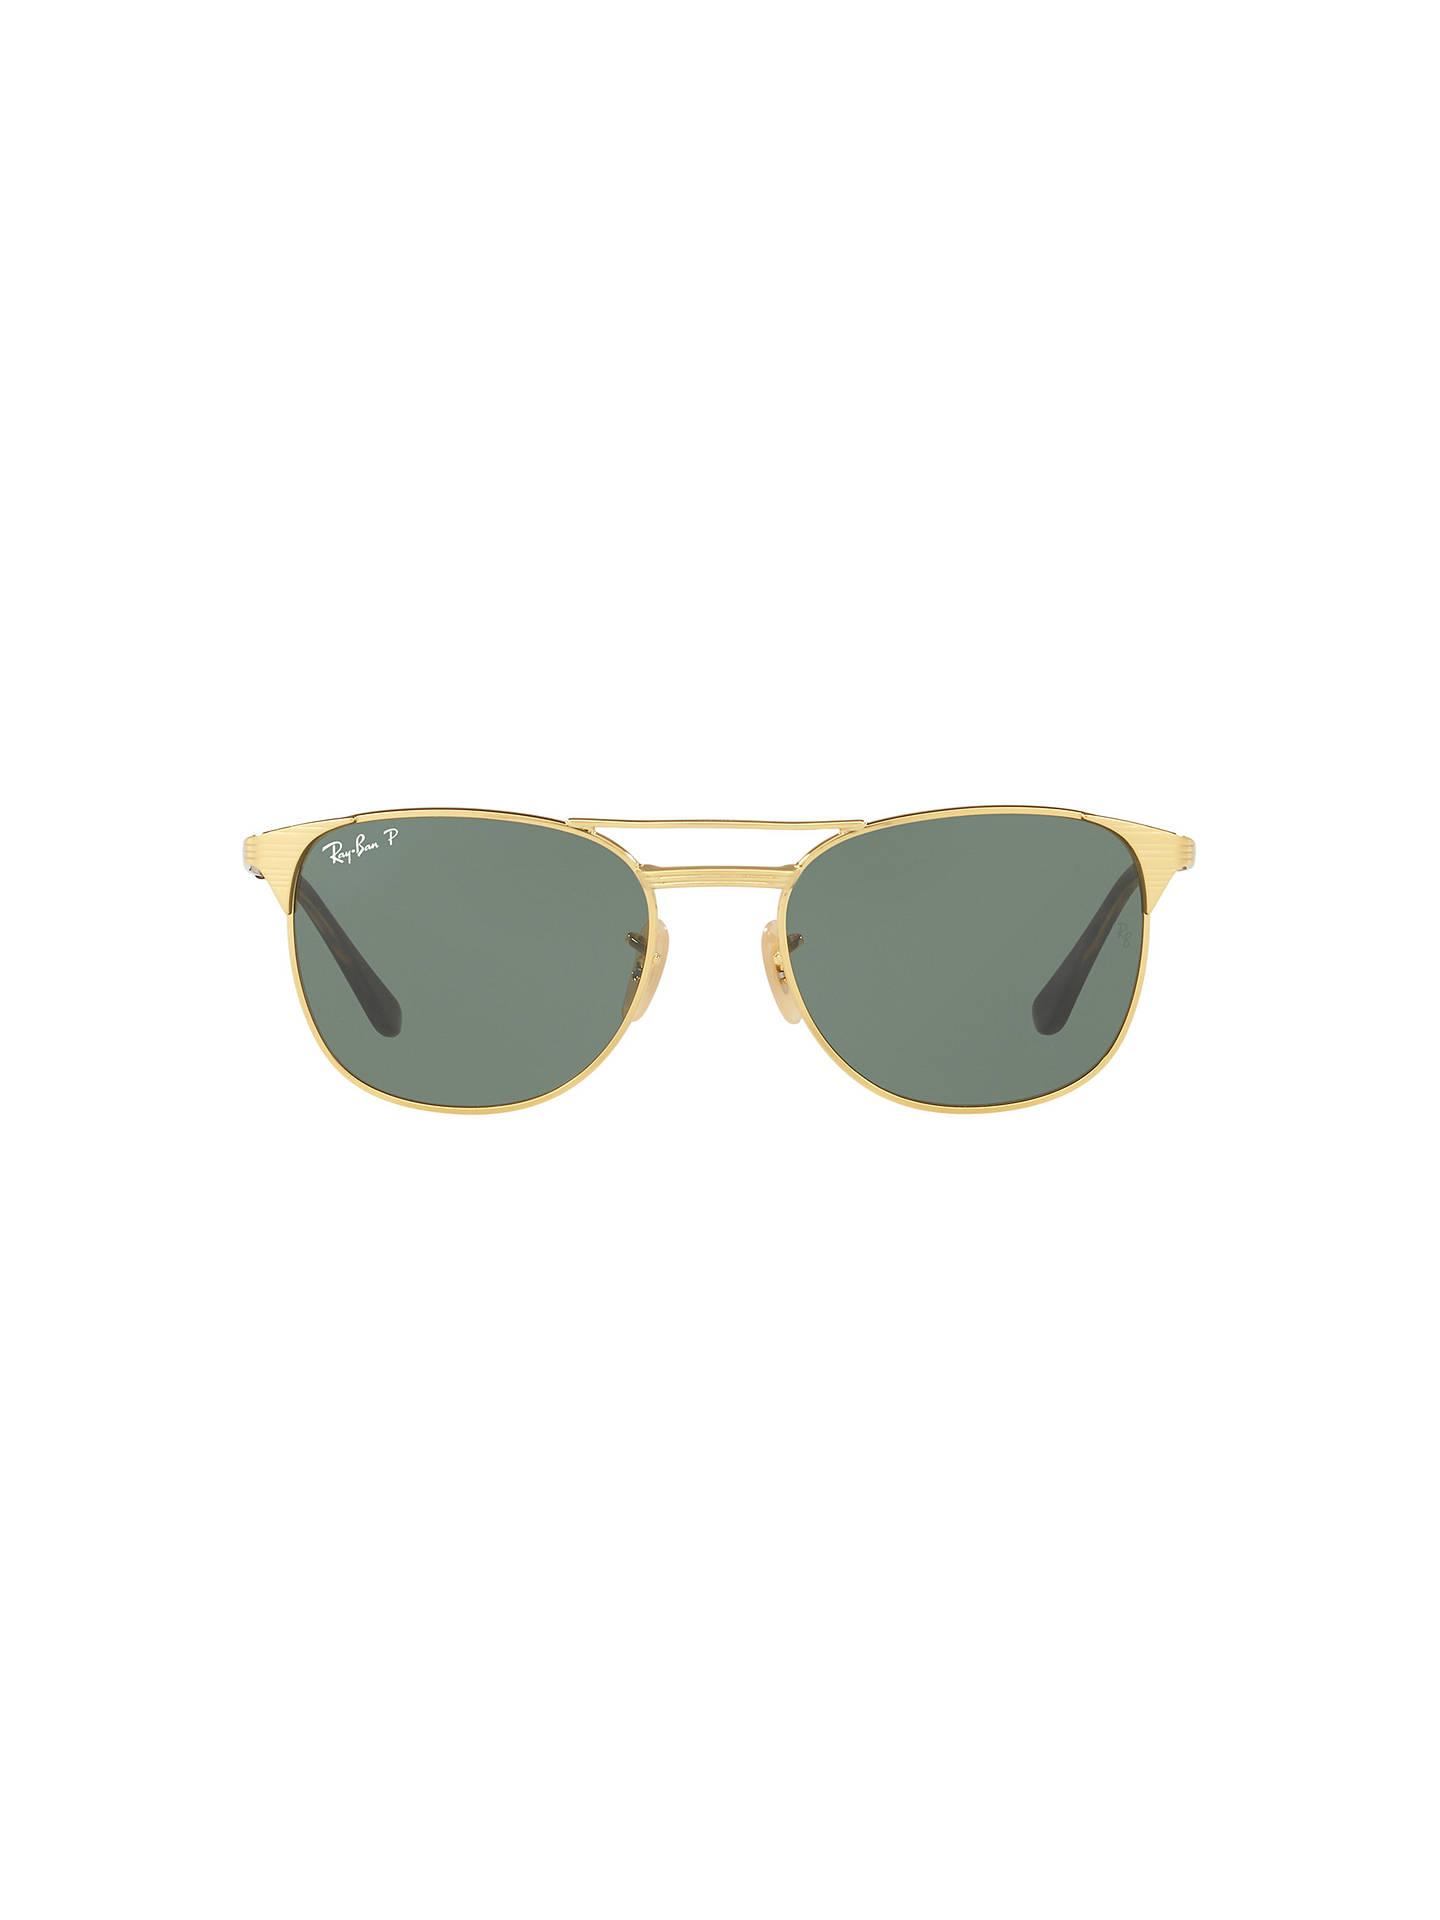 0d3c0f647da7d ... Buy Ray-Ban RB3429M Signet Polarised Square Sunglasses